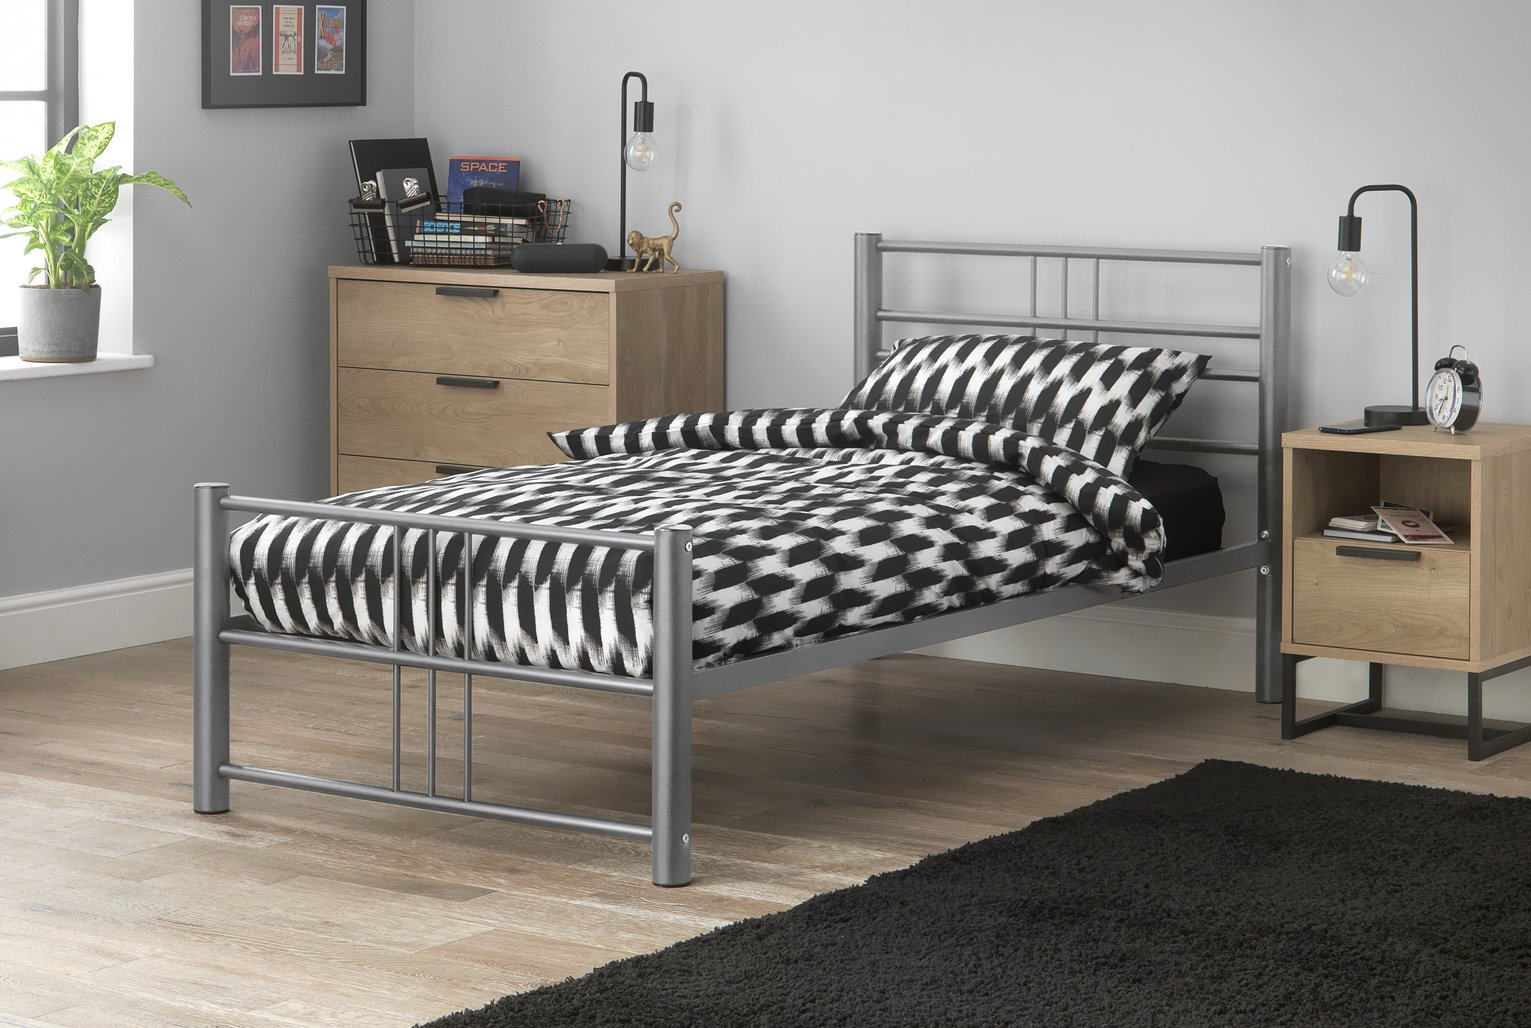 Argos Home Atlas Single Metal Bed Frame review